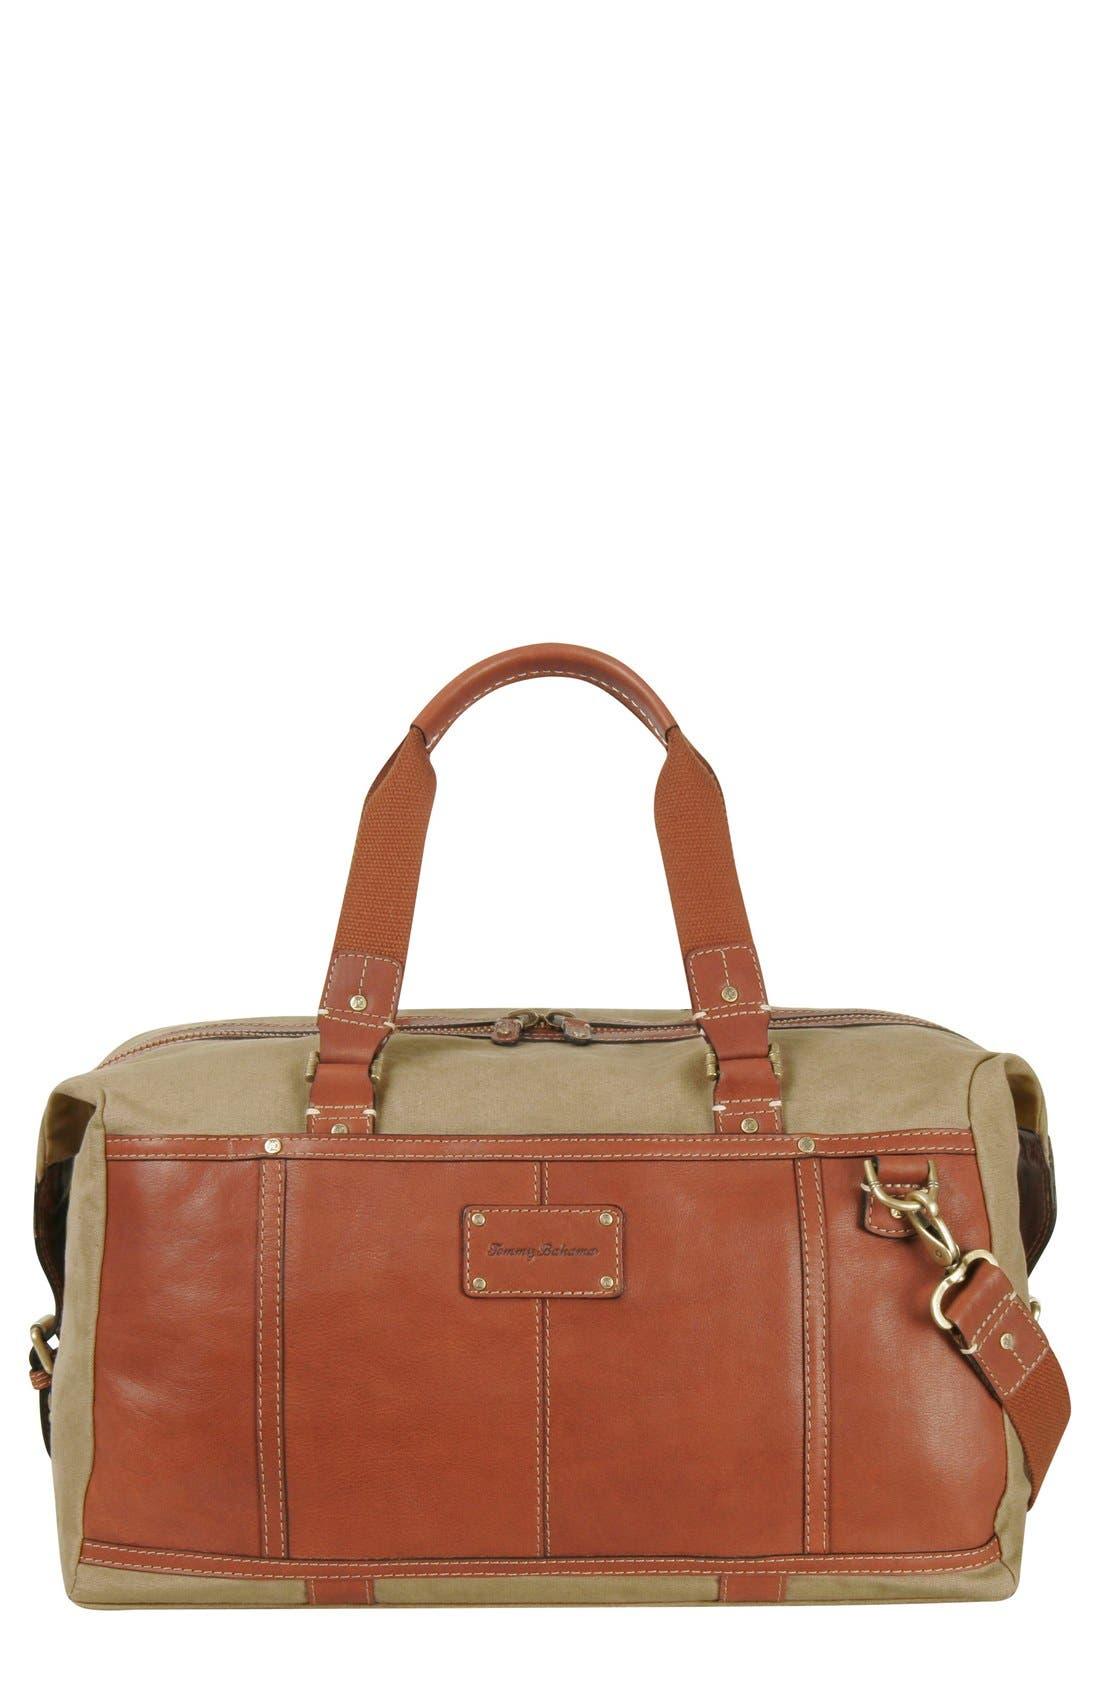 Tommy Bahama Canvas & Leather Duffel Bag